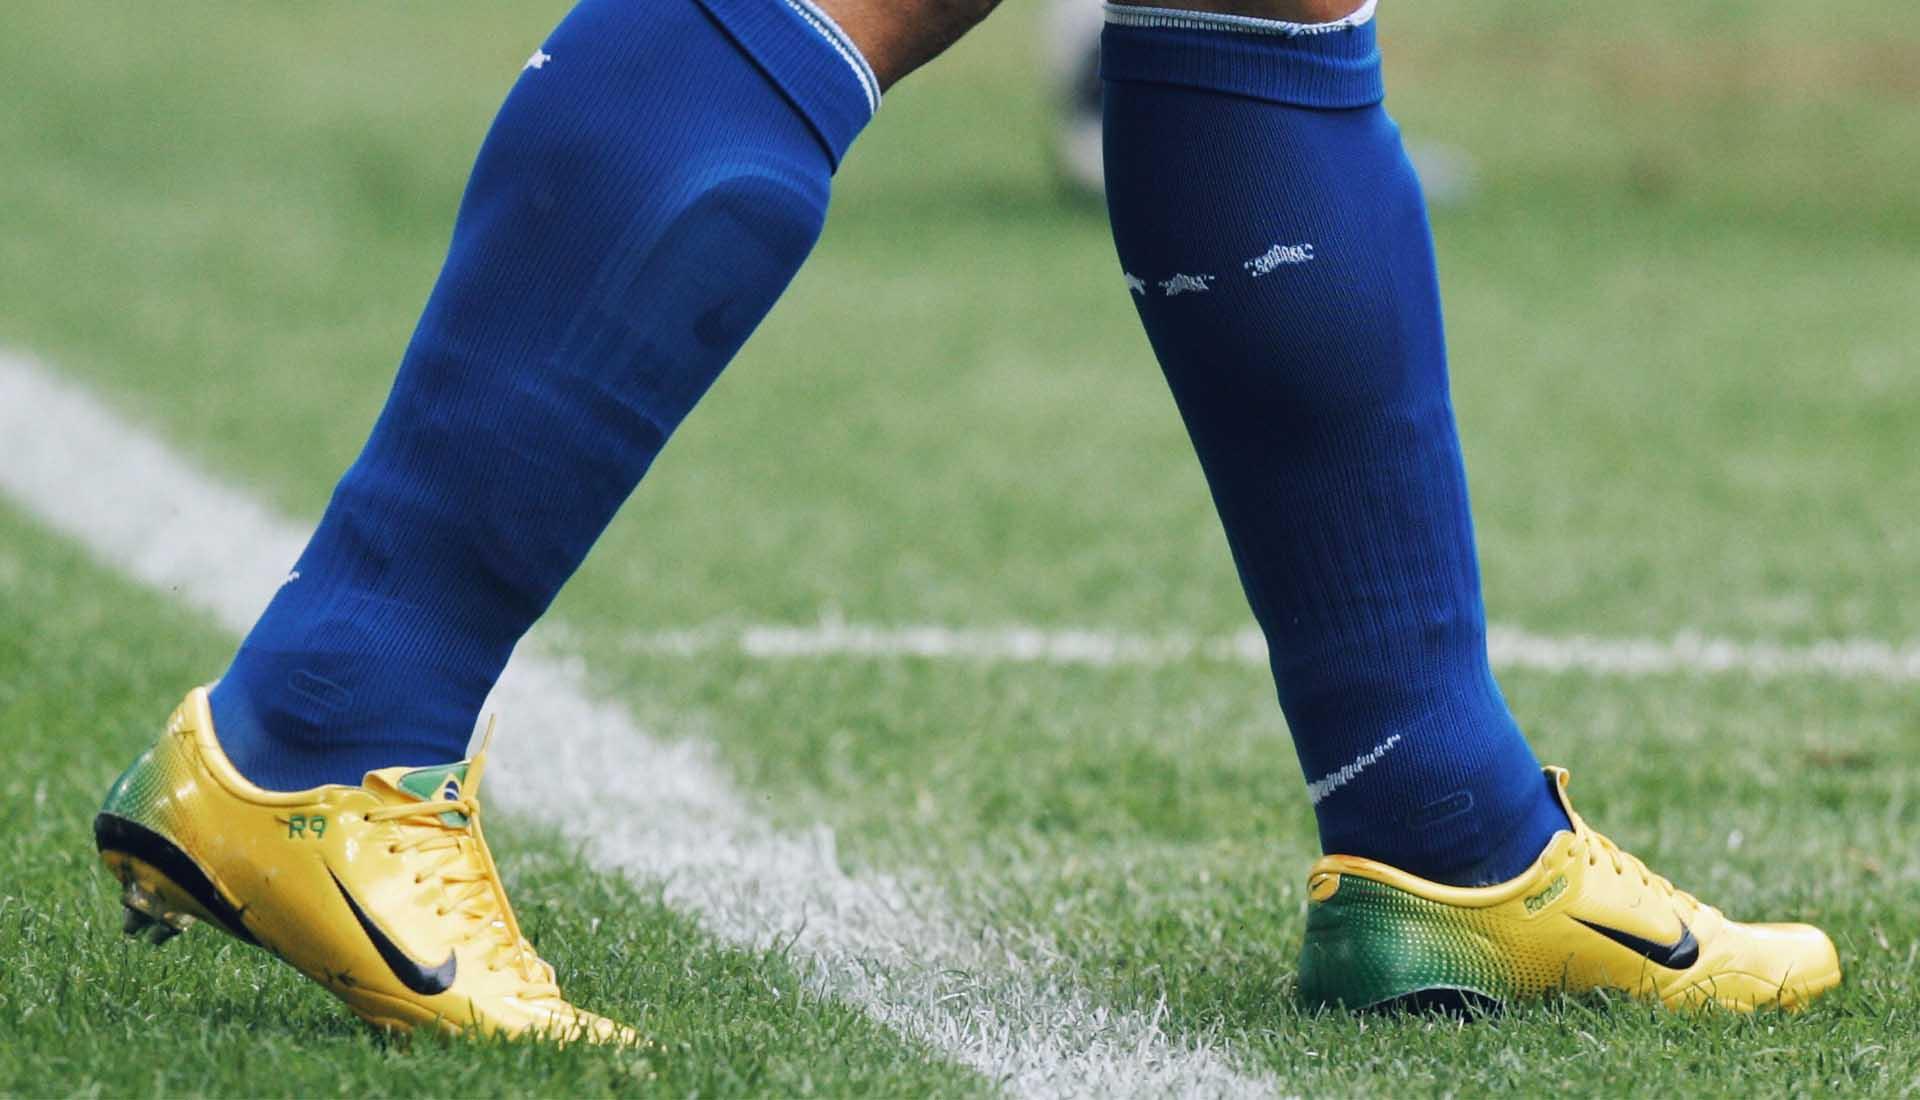 Despertar suave Corta vida  Remembering R9's World Cup Boots: 1998 – 2006 - SoccerBible